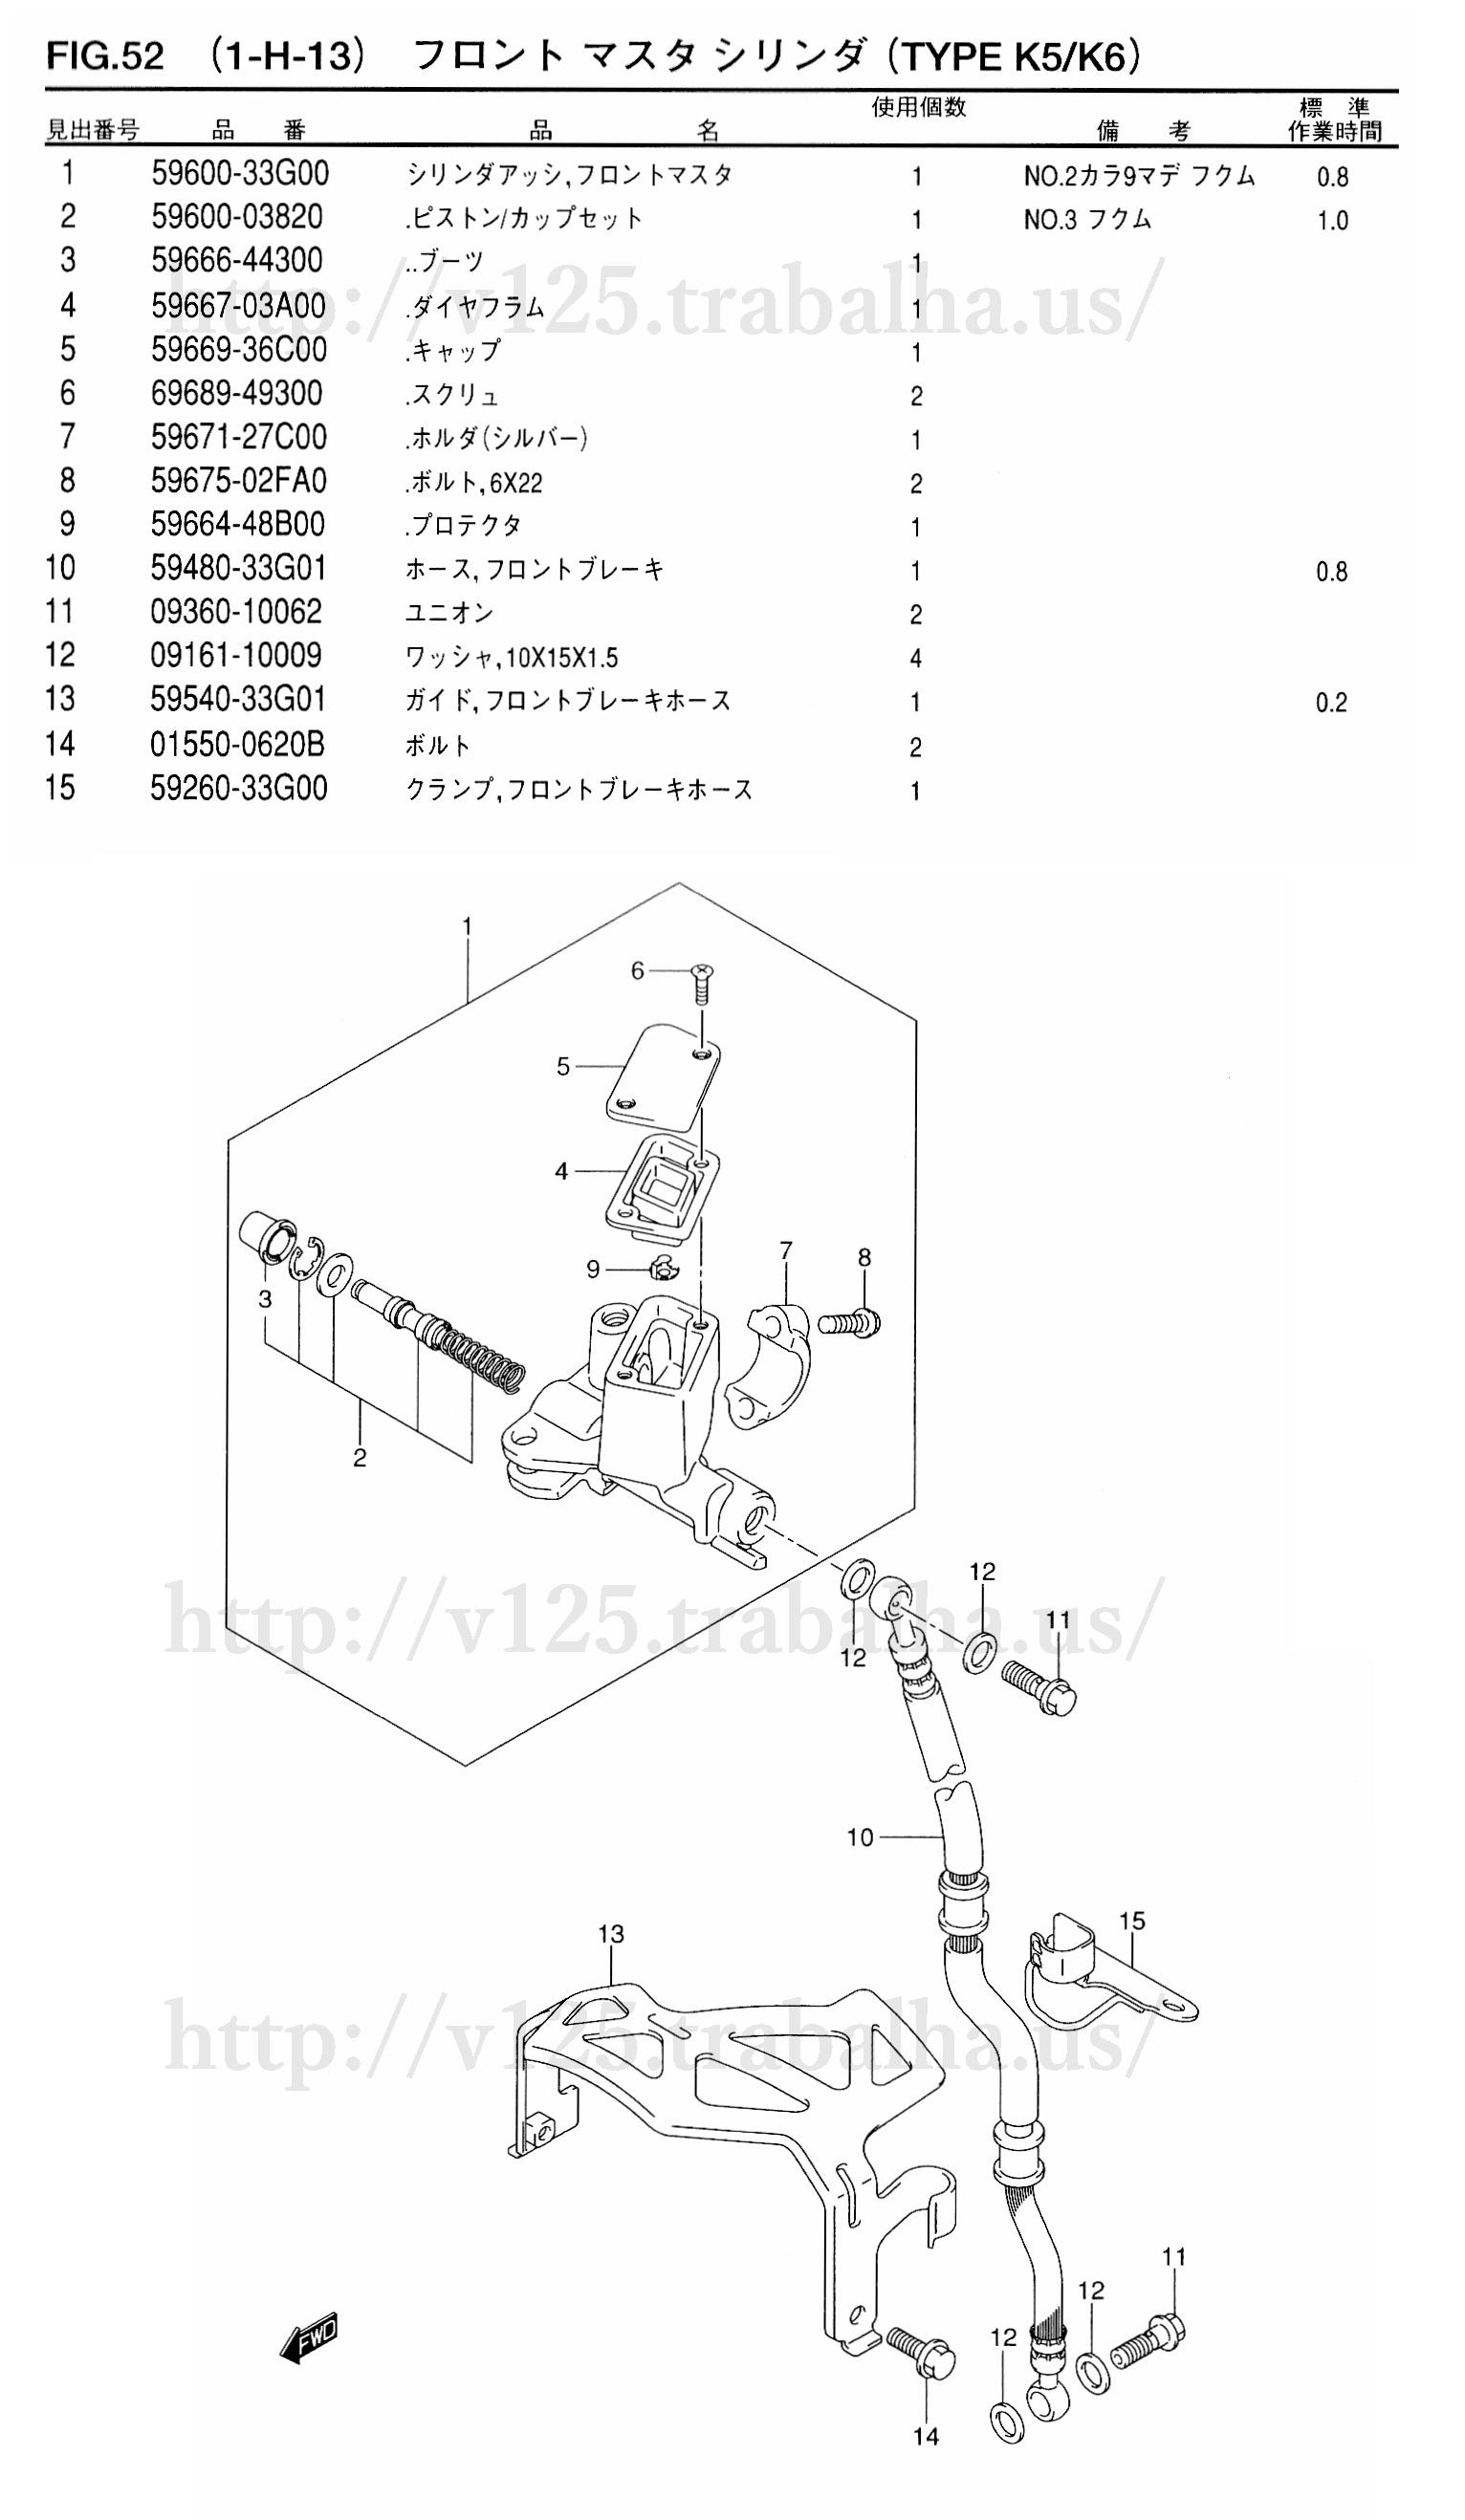 FIG.52(1-H-13)フロント マスタ シリンダ(TYPE K5/K6)